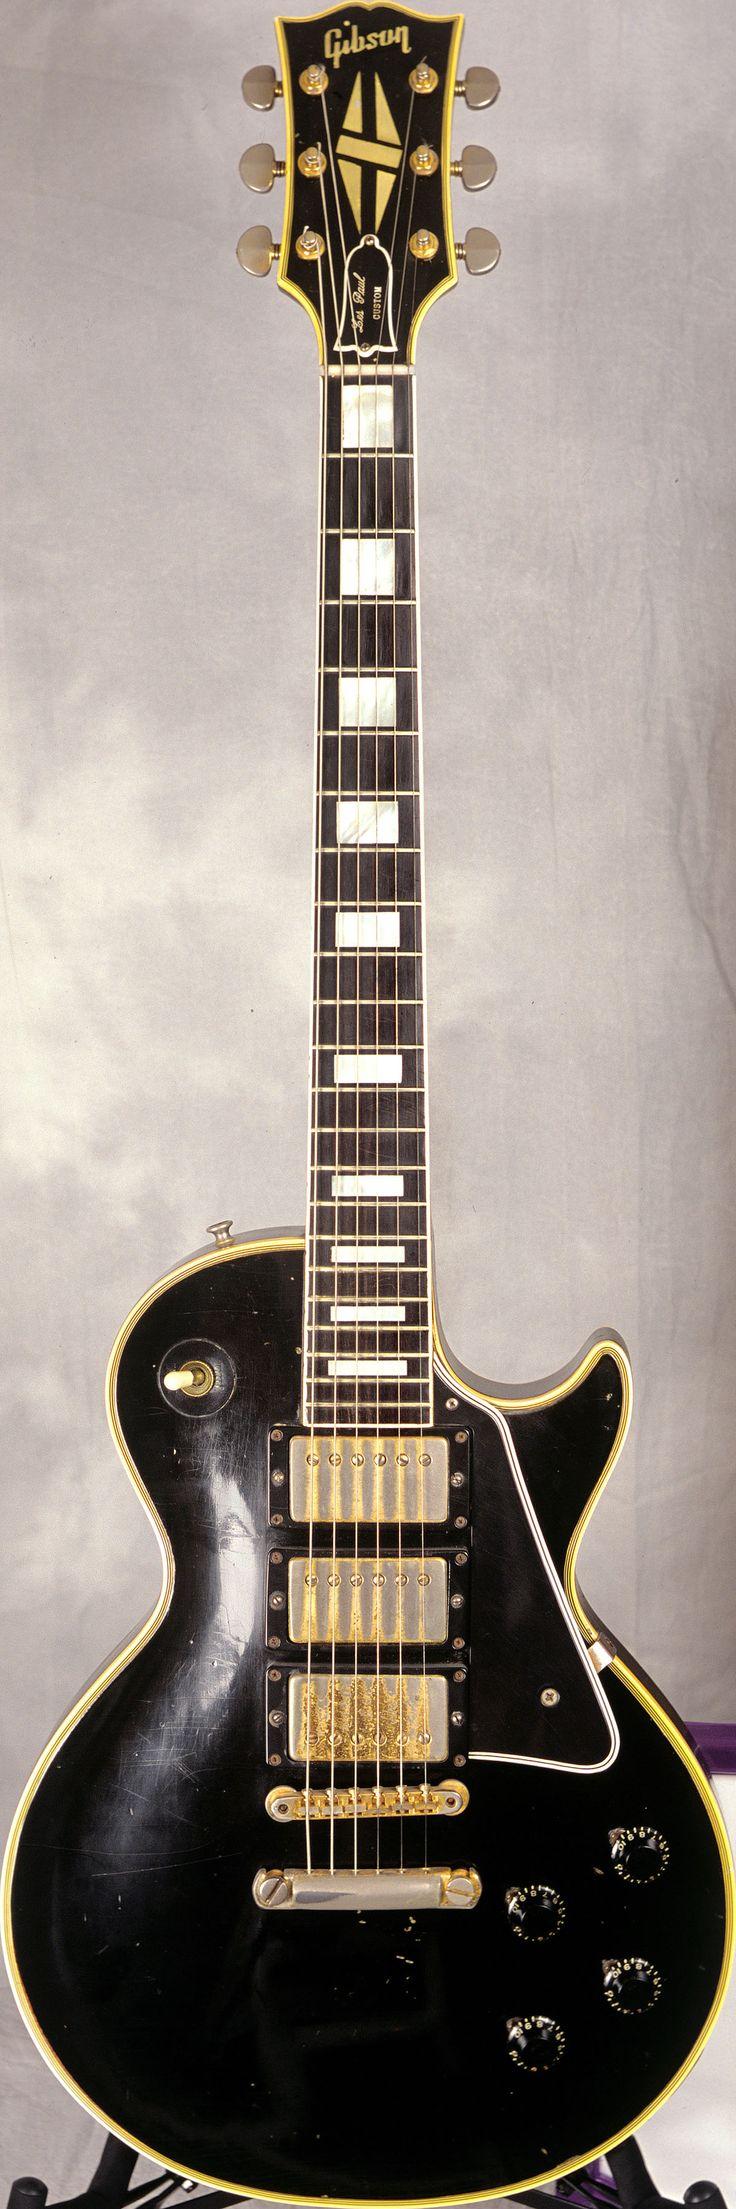 1958 Gibson Les Paul Custom